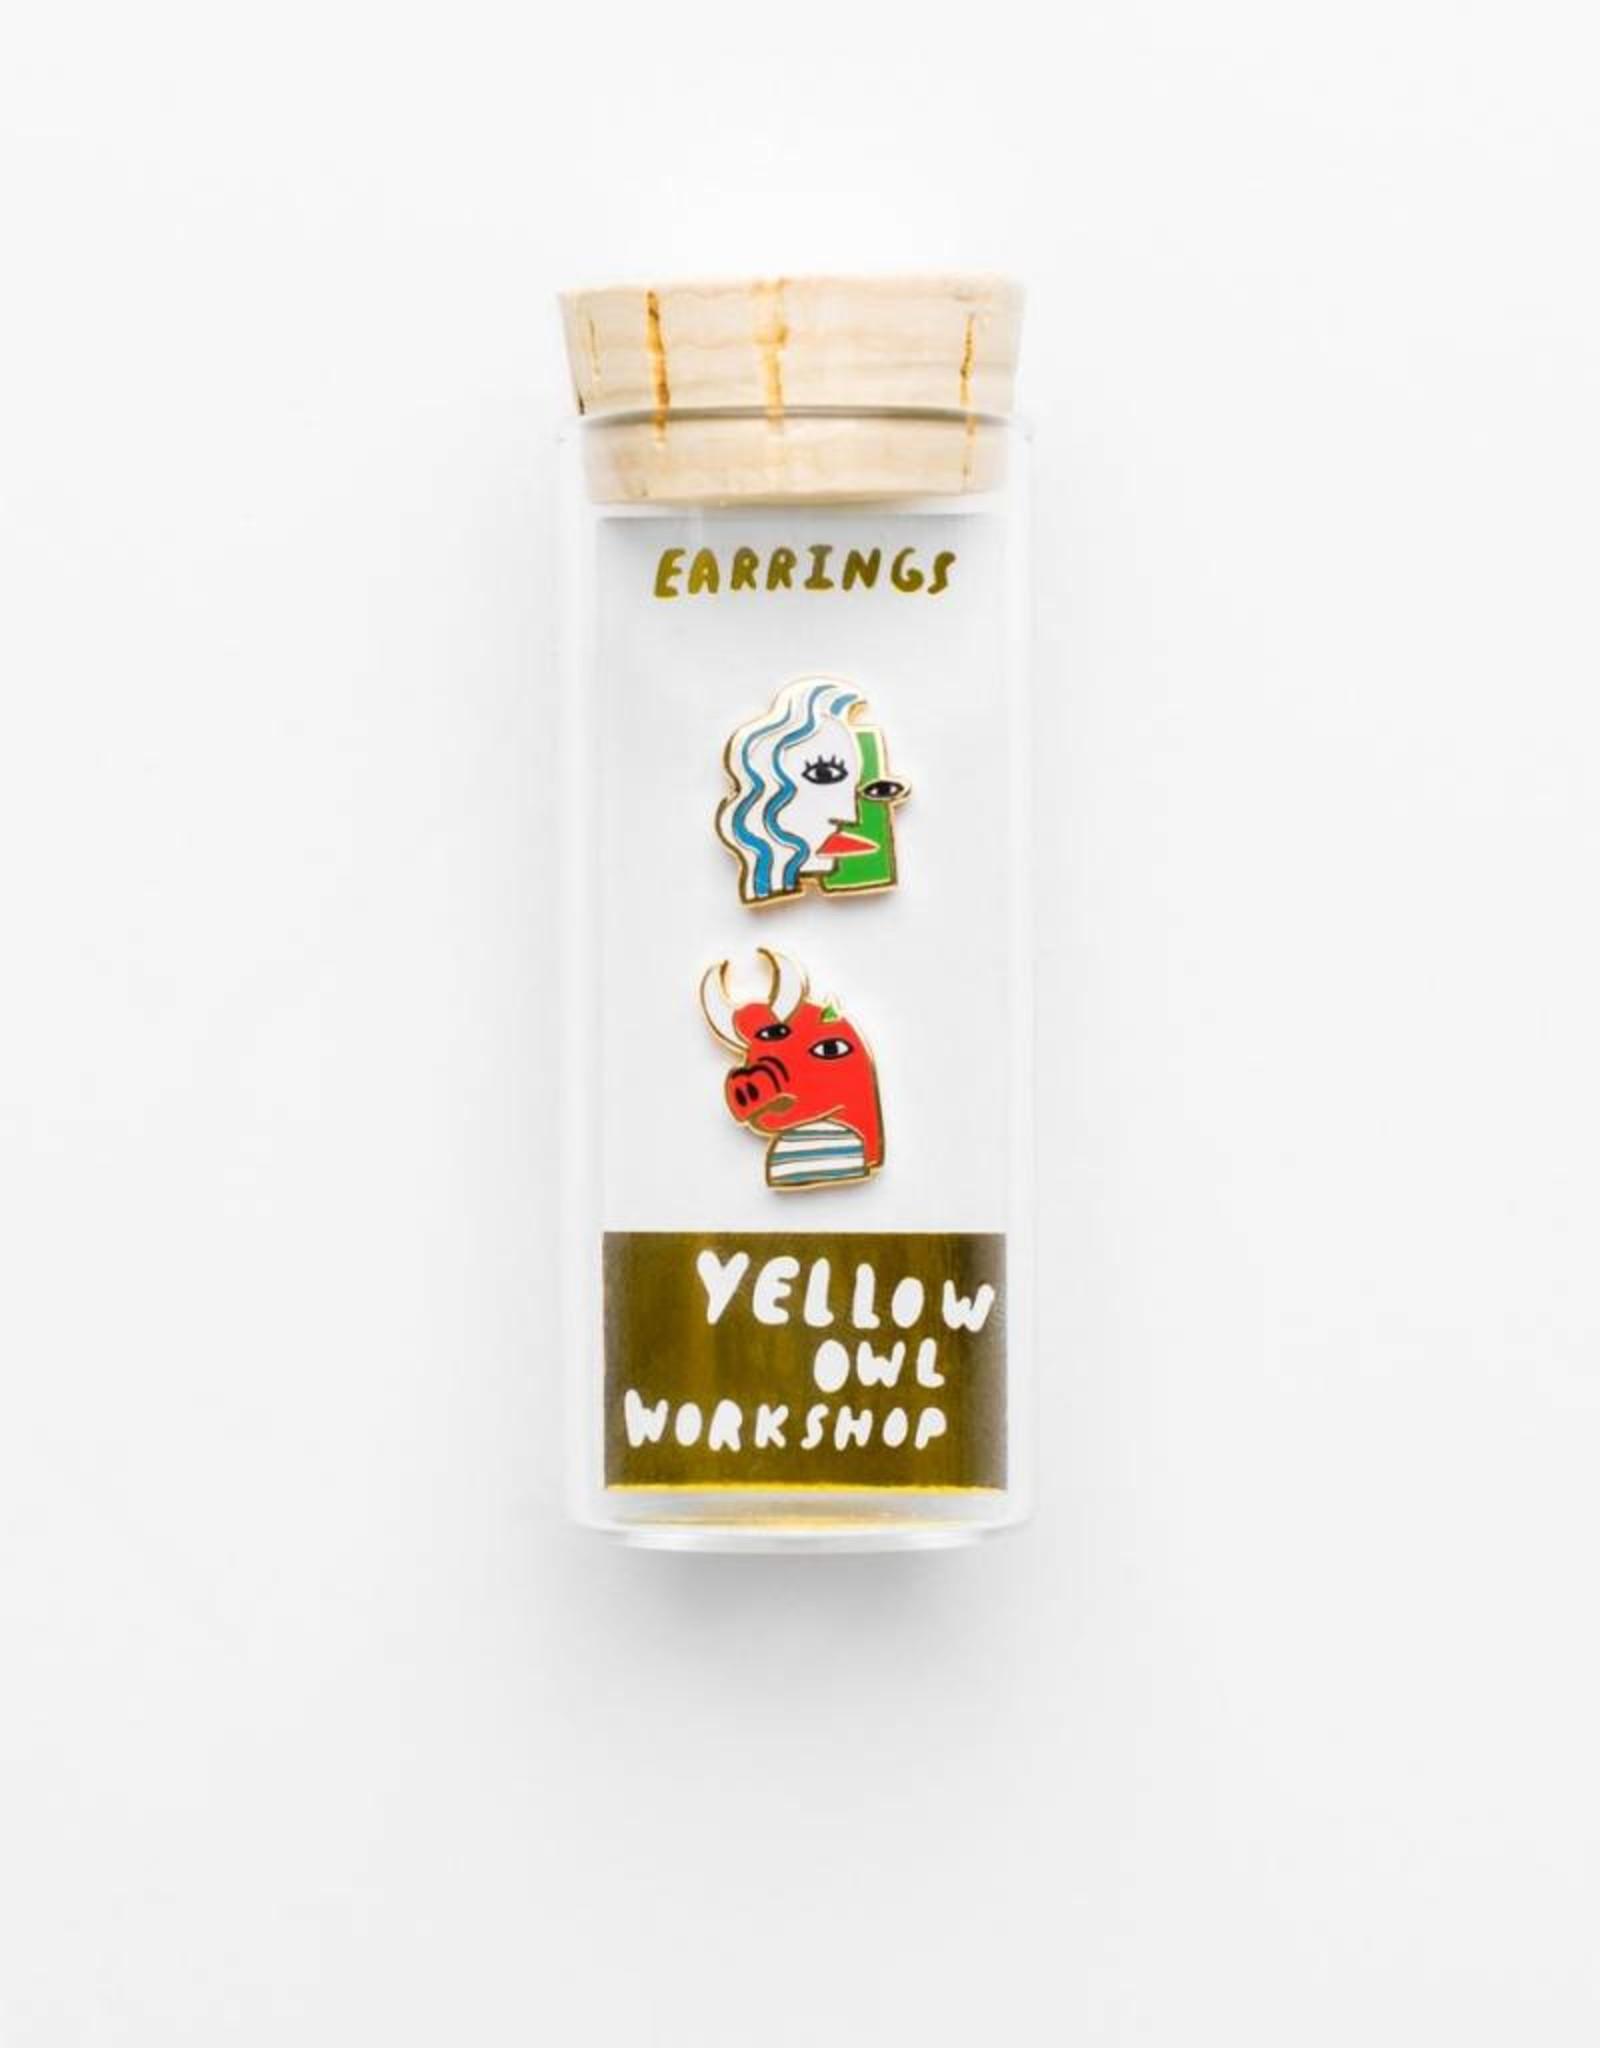 Yellow Owl Workshop Yellow Owl Workshop Earrings